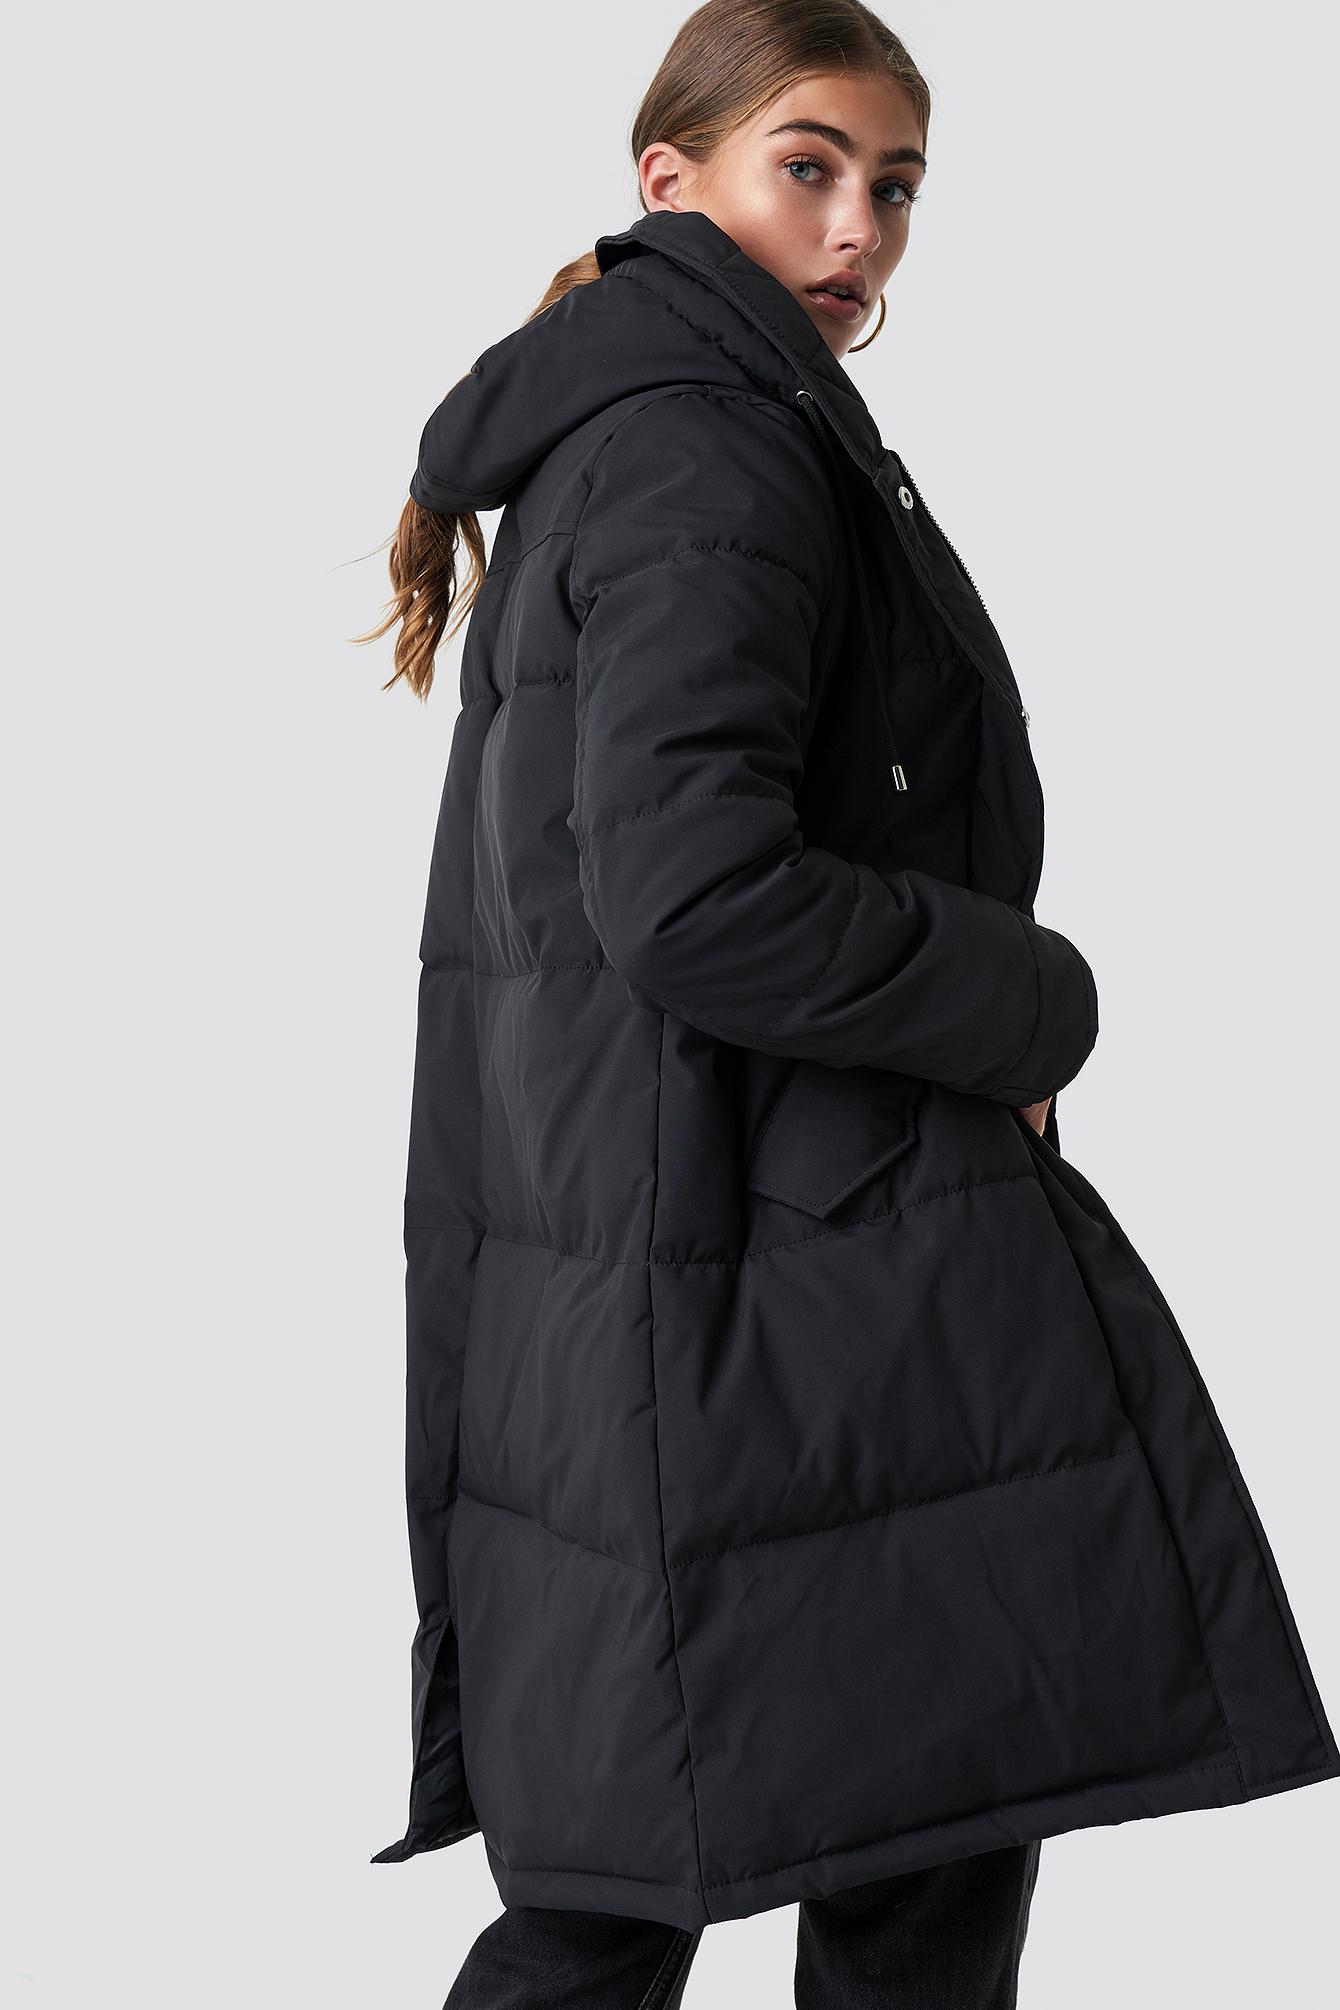 Watowana kurtka z kapturem NA-KD.COM